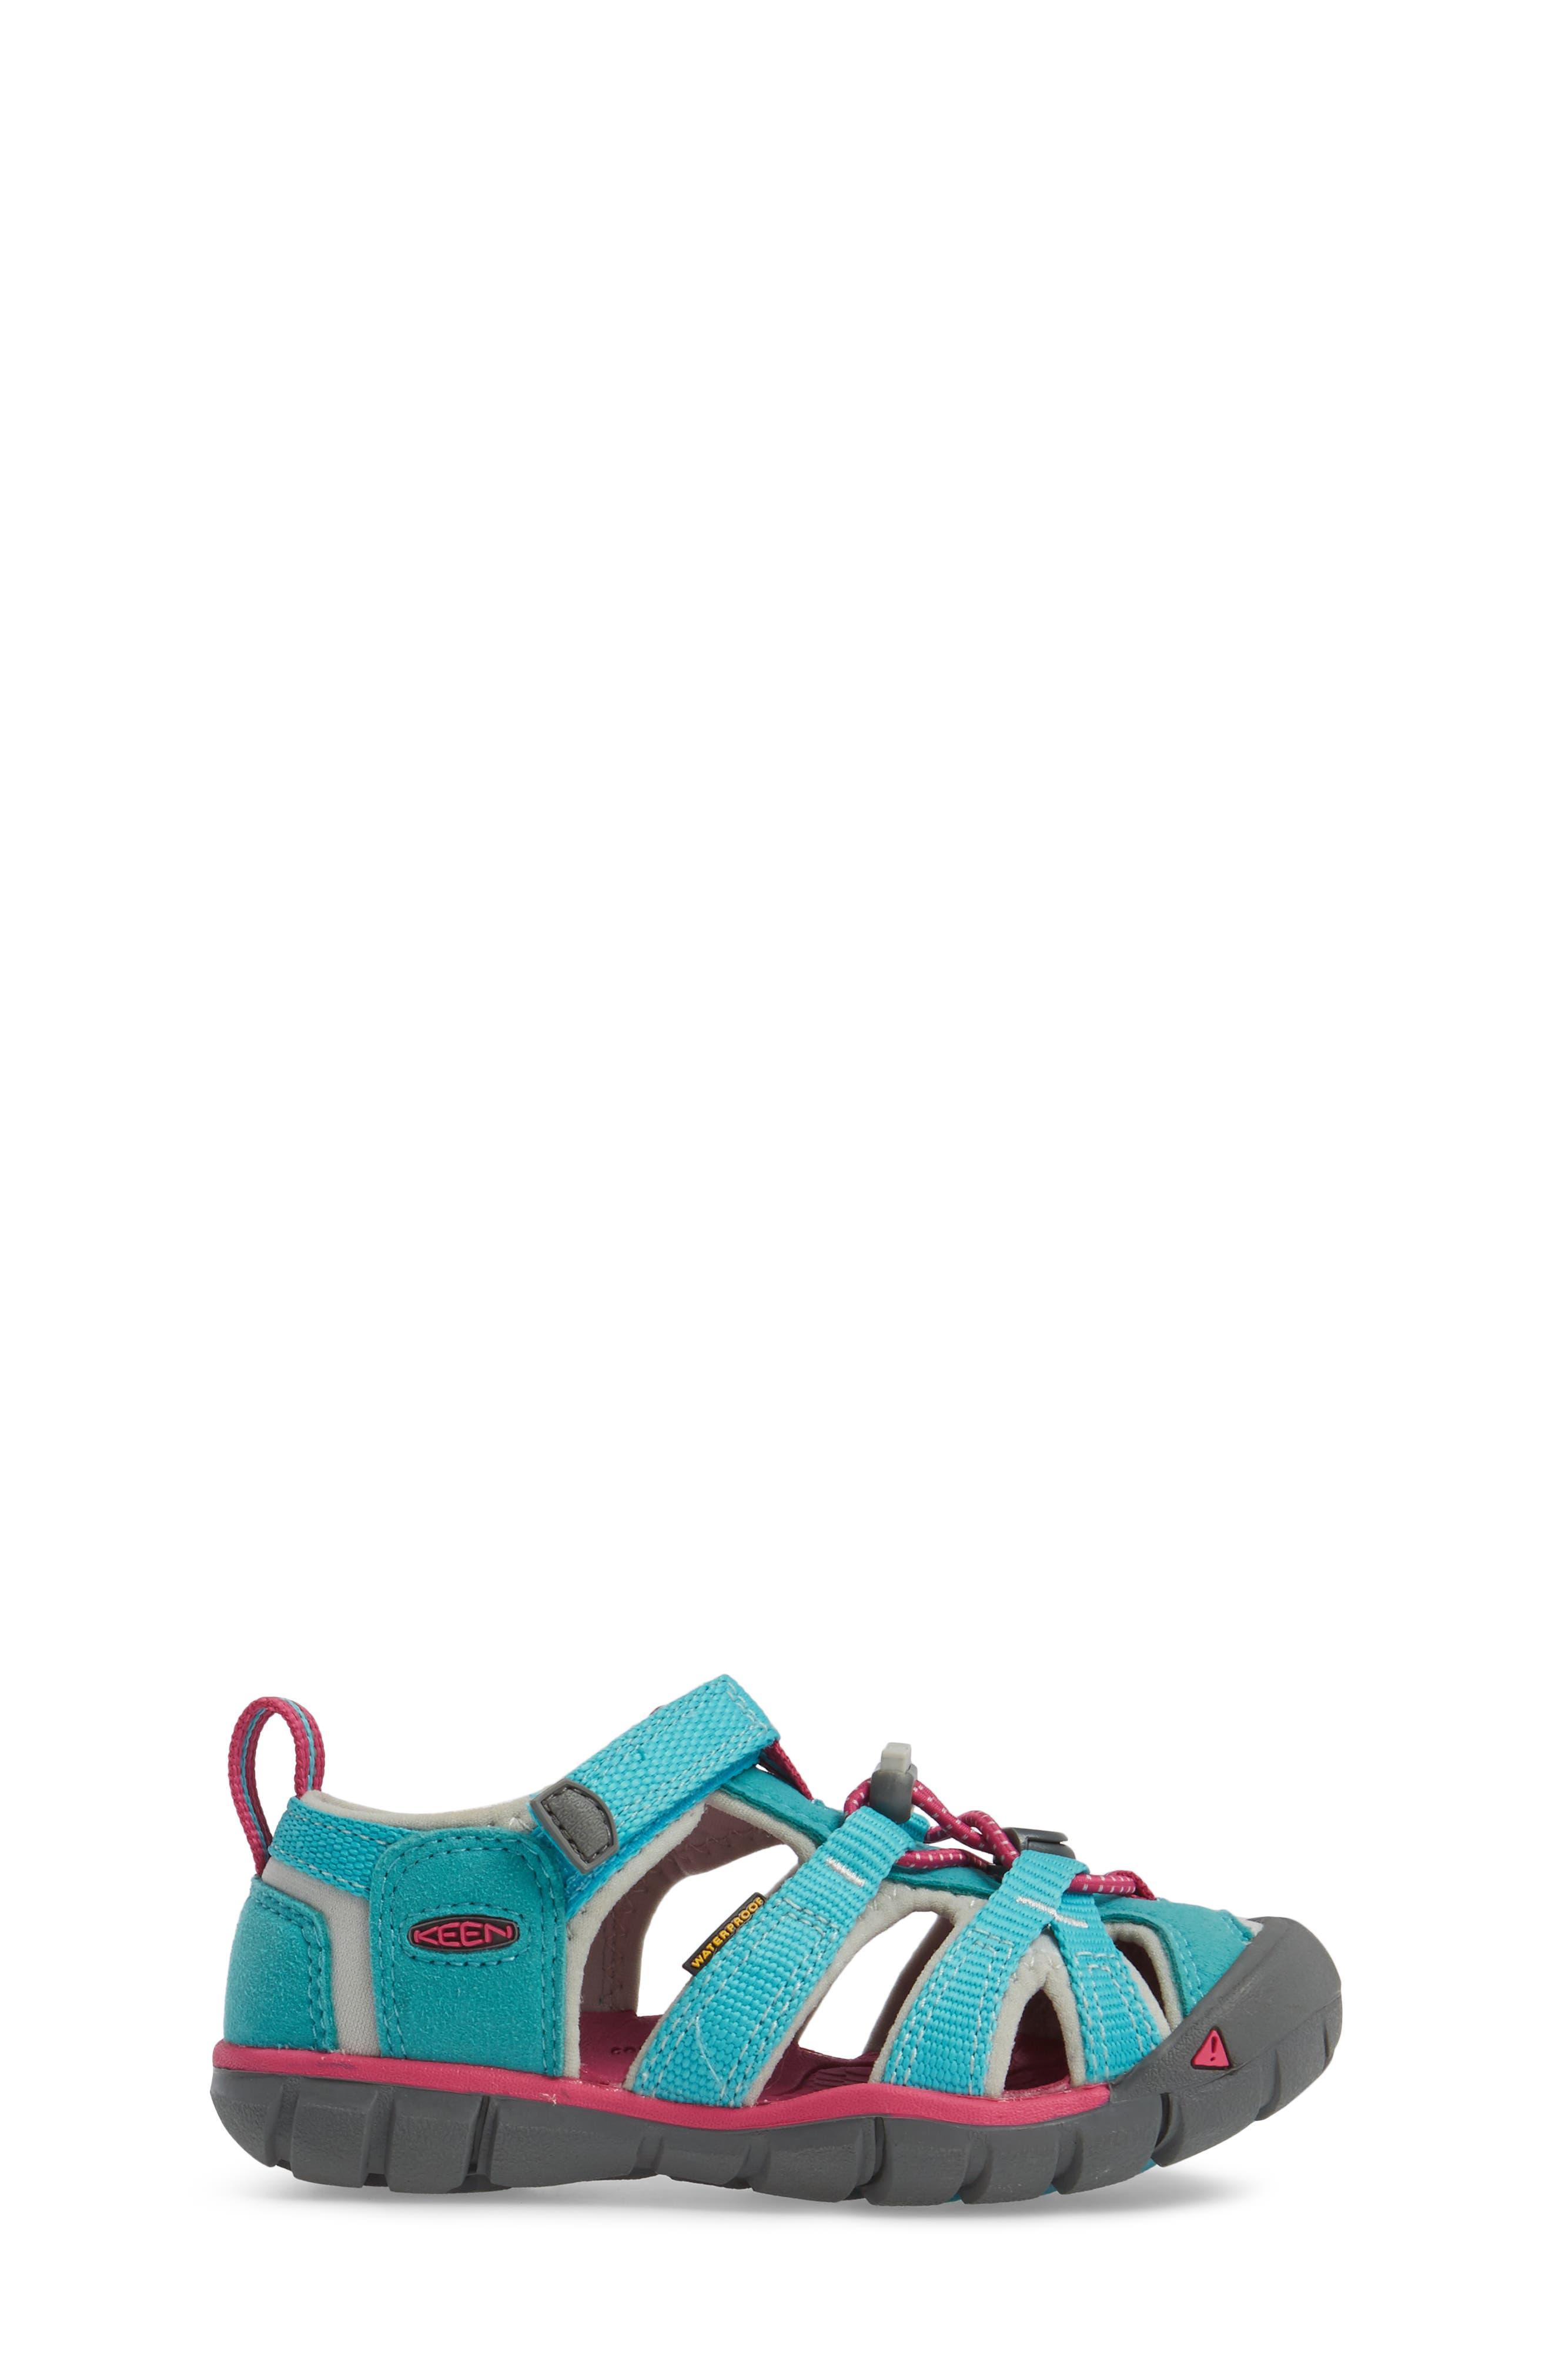 ,                             'Seacamp II' Water Friendly Sandal,                             Alternate thumbnail 219, color,                             502